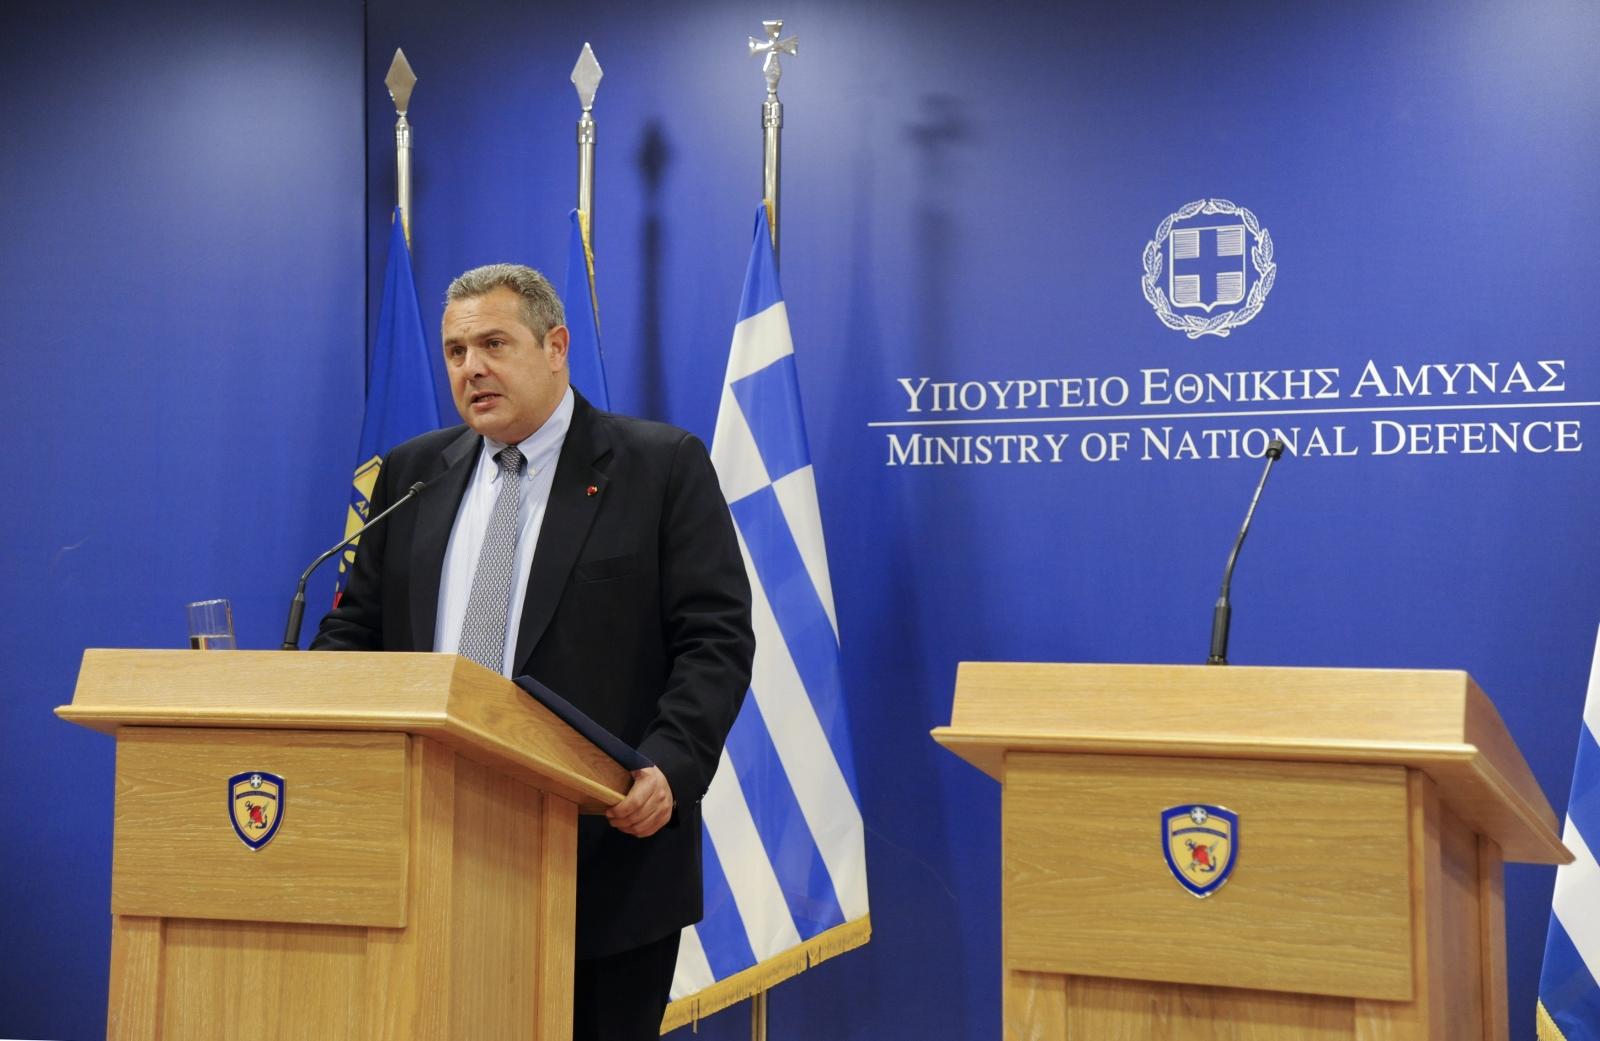 Panos Kammenos